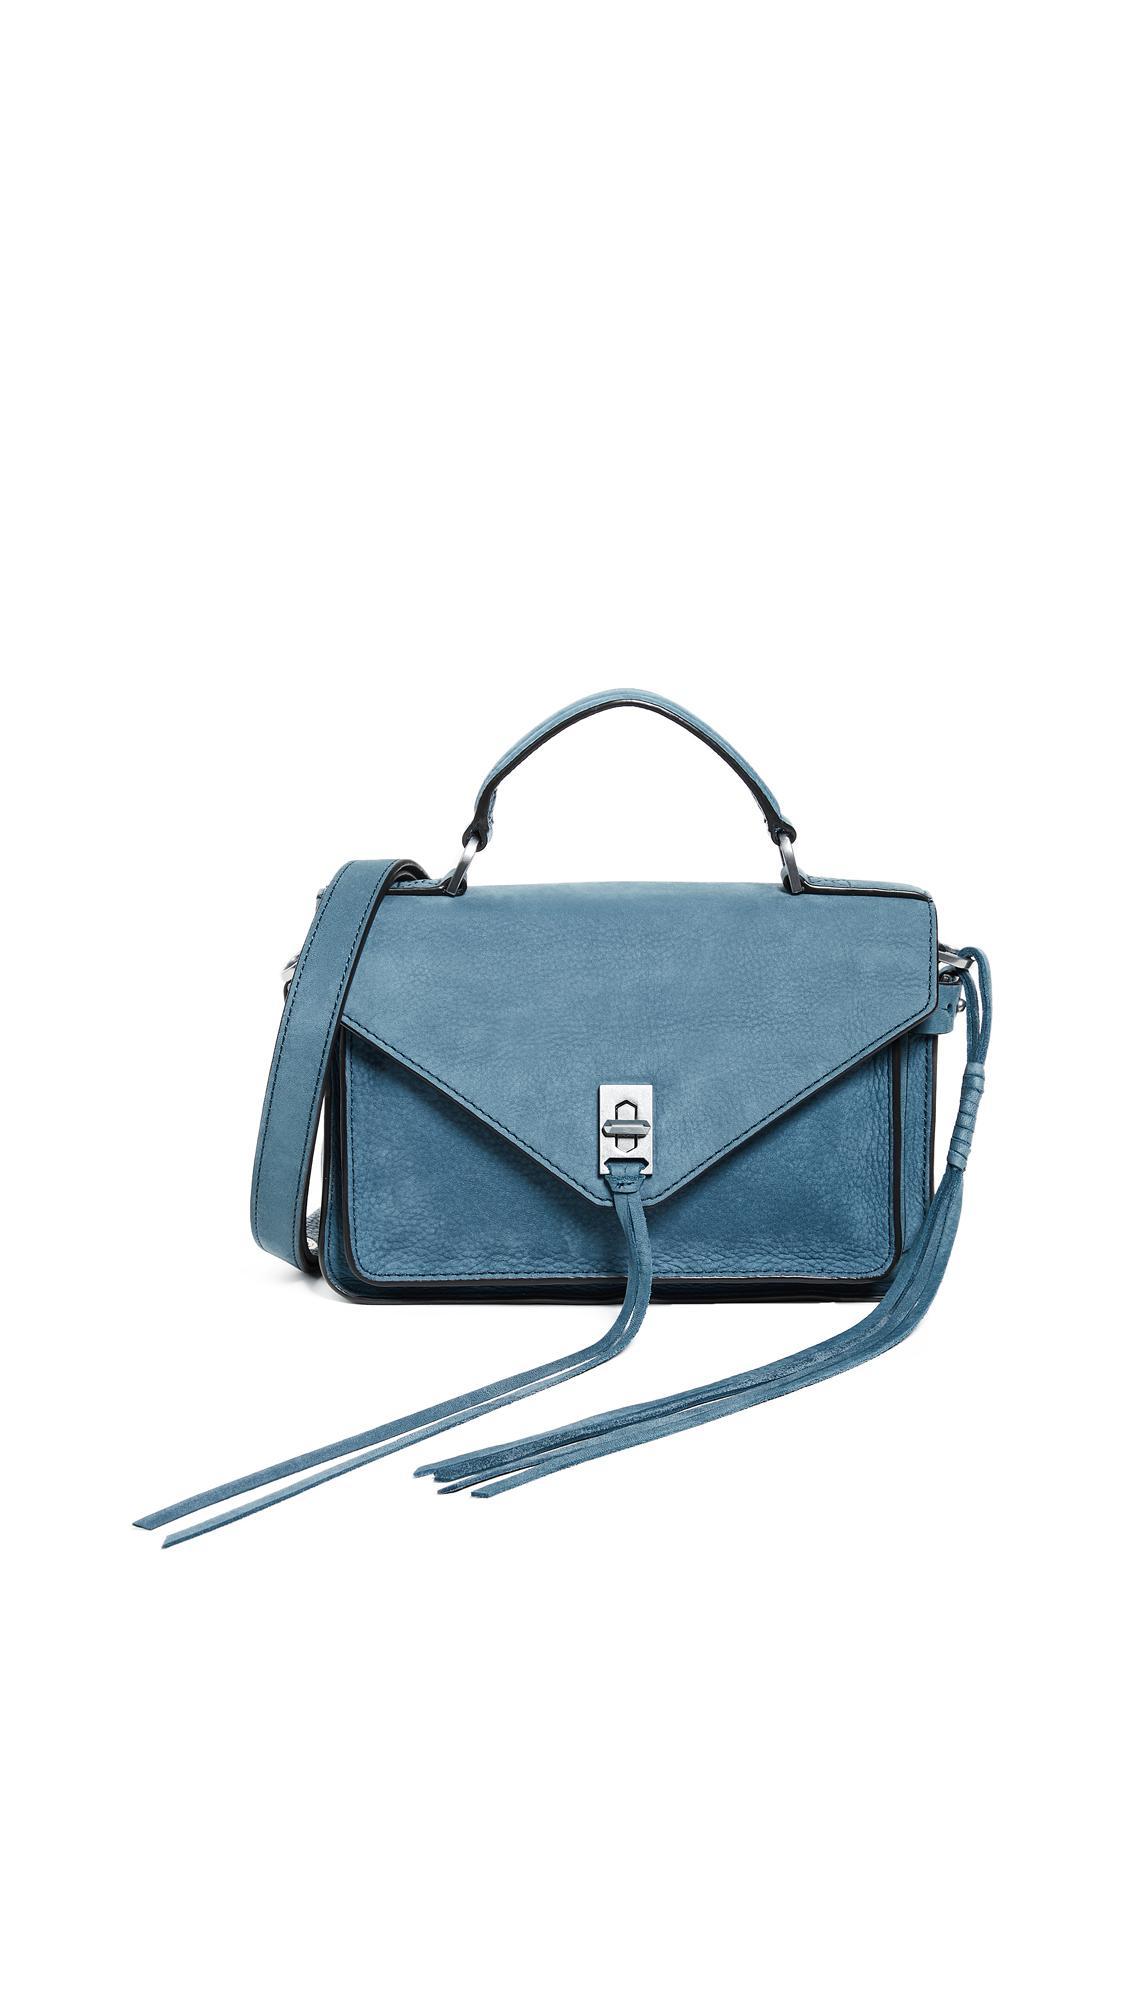 Rebecca Minkoff Small Darren Messenger Bag In Octavio